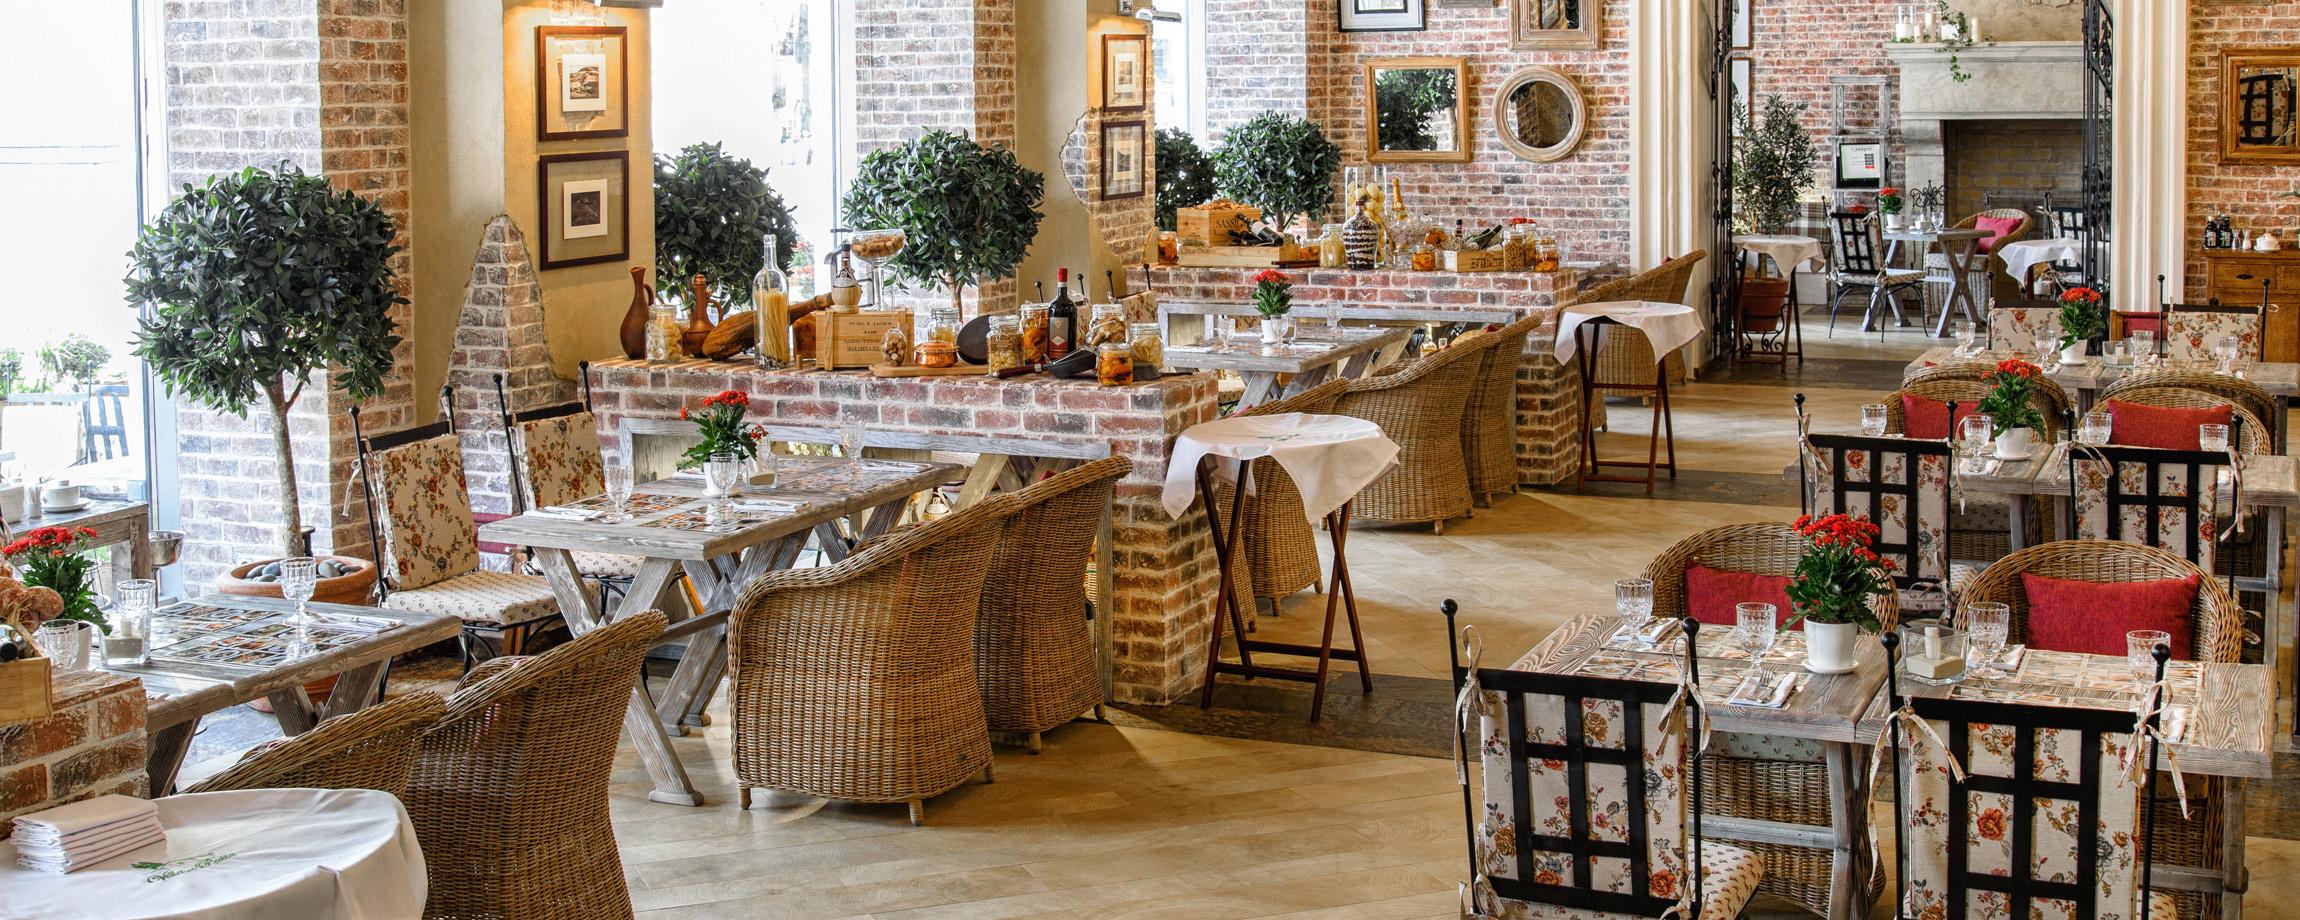 Restoran Villa della Pasta